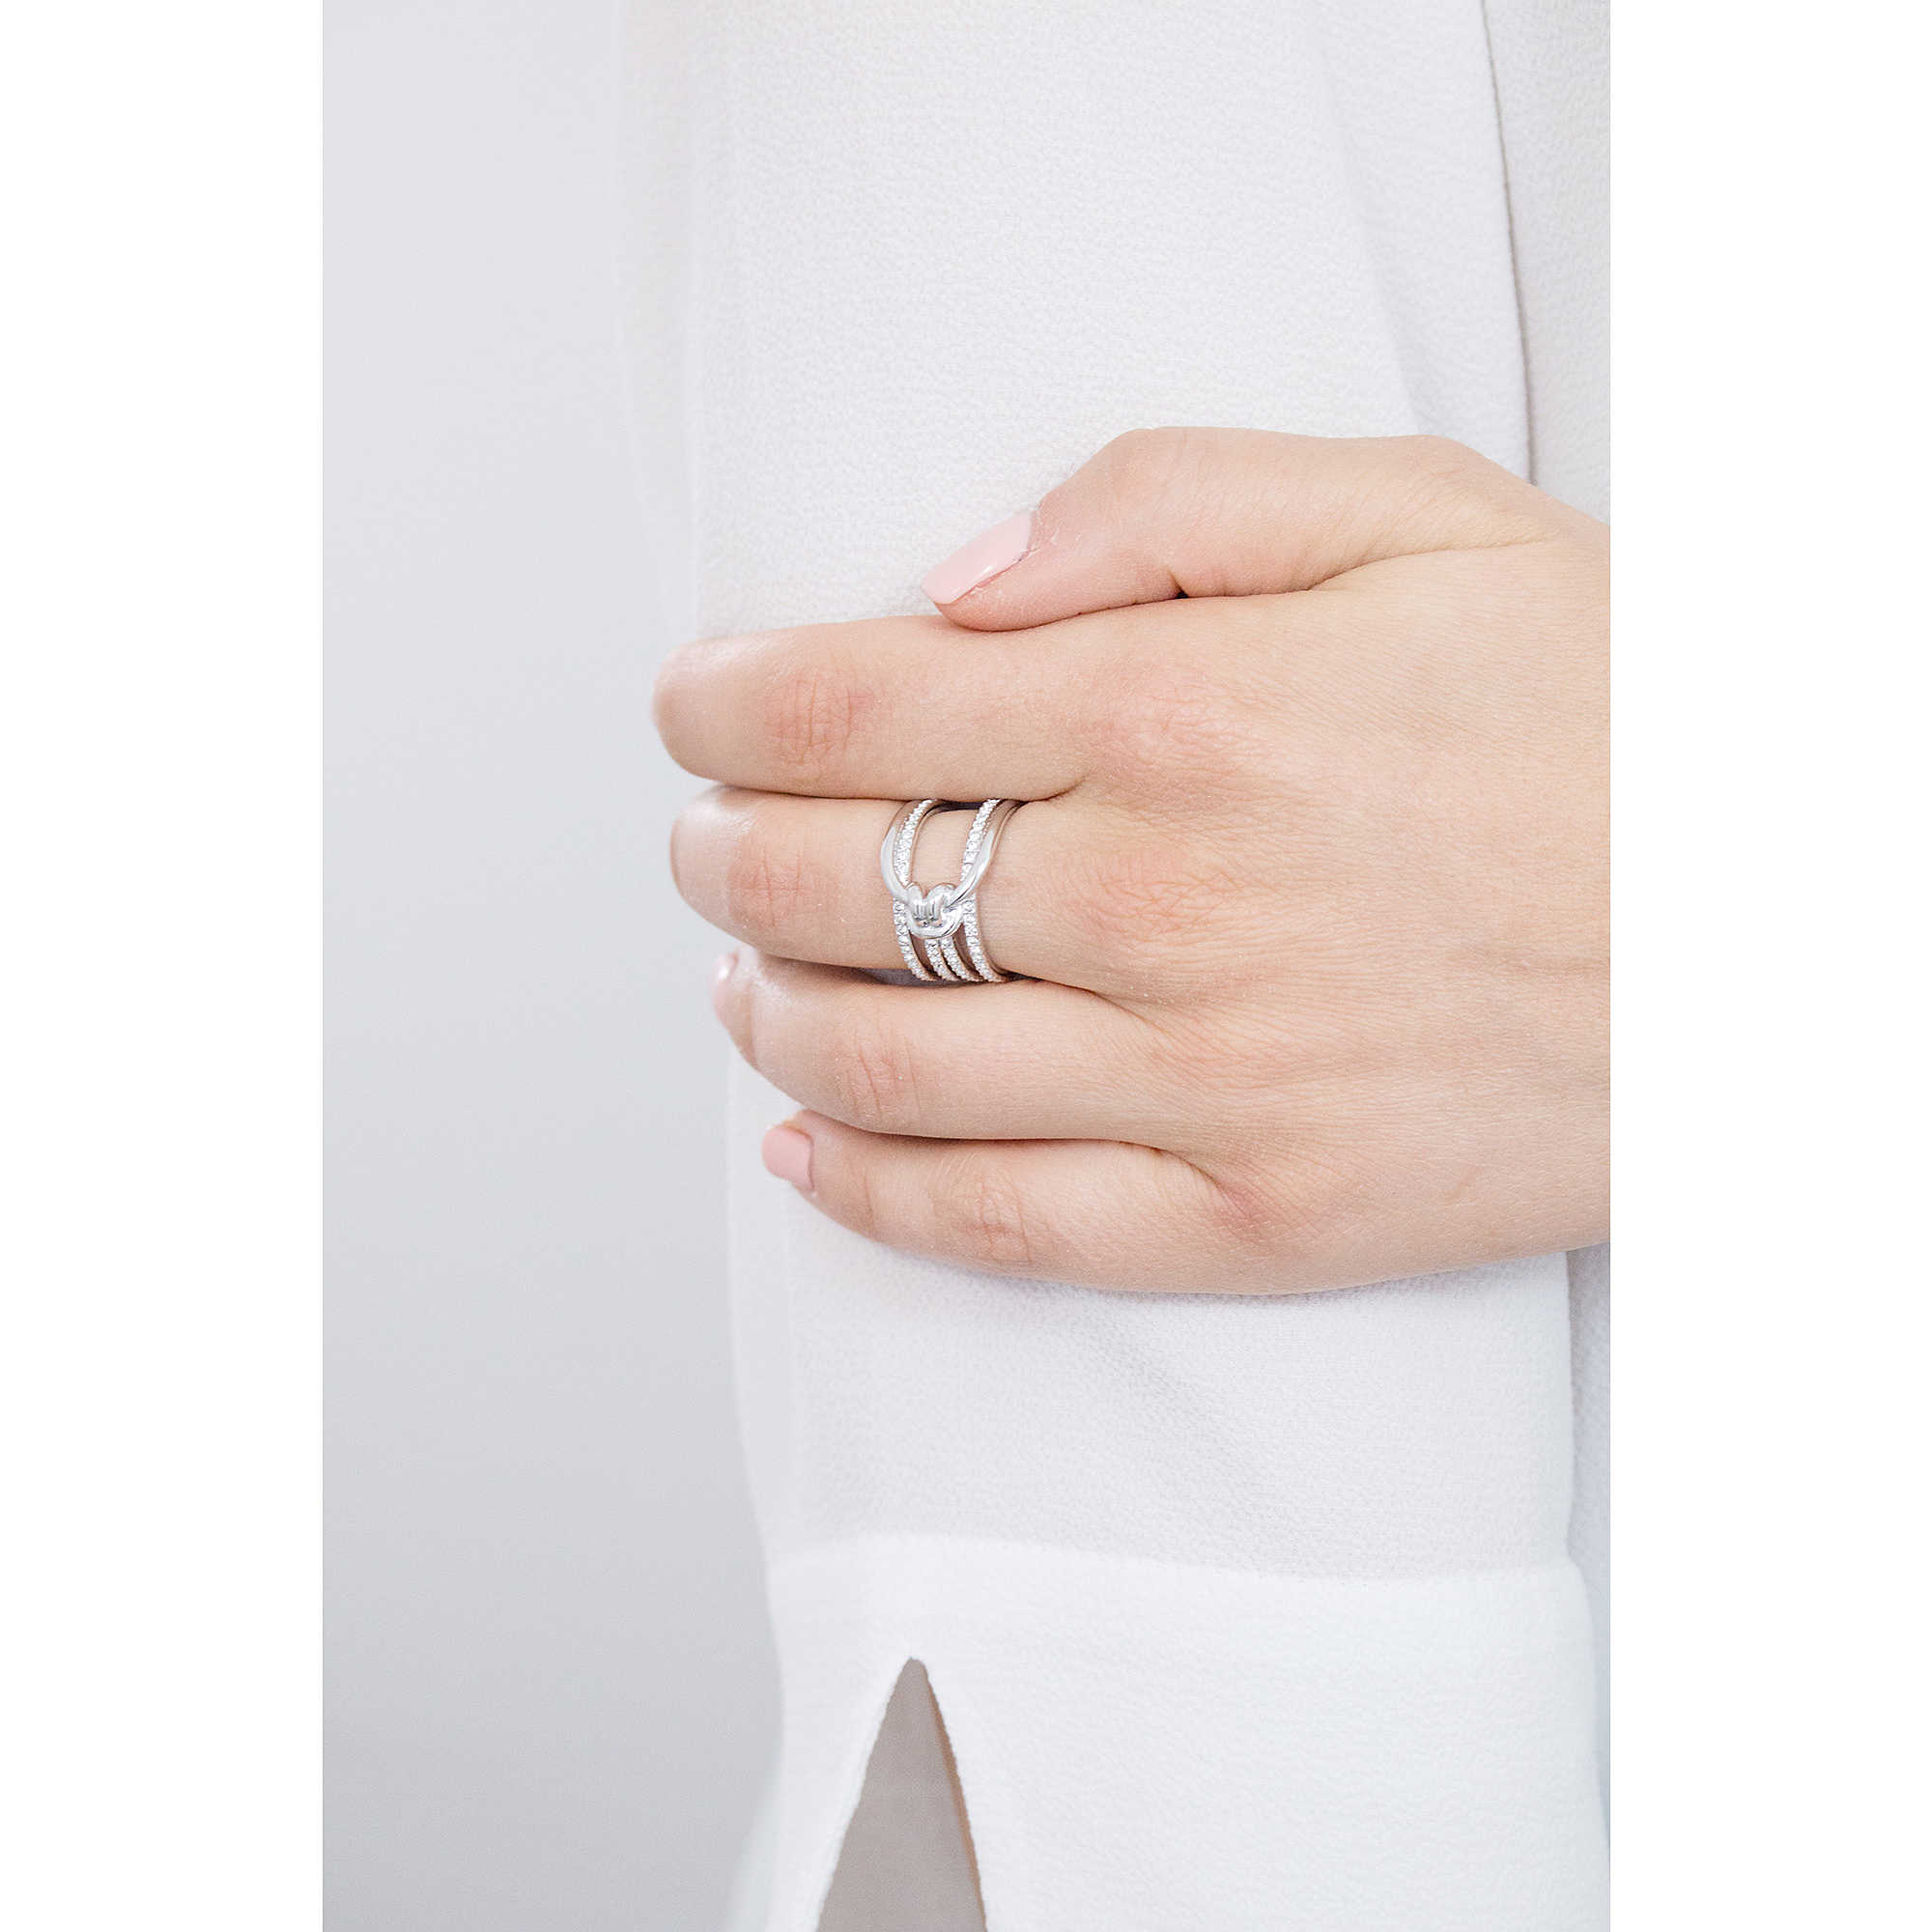 bague femme bijoux Swarovski Lifelong 5402449 bagues Swarovski 7dc922cfce8c